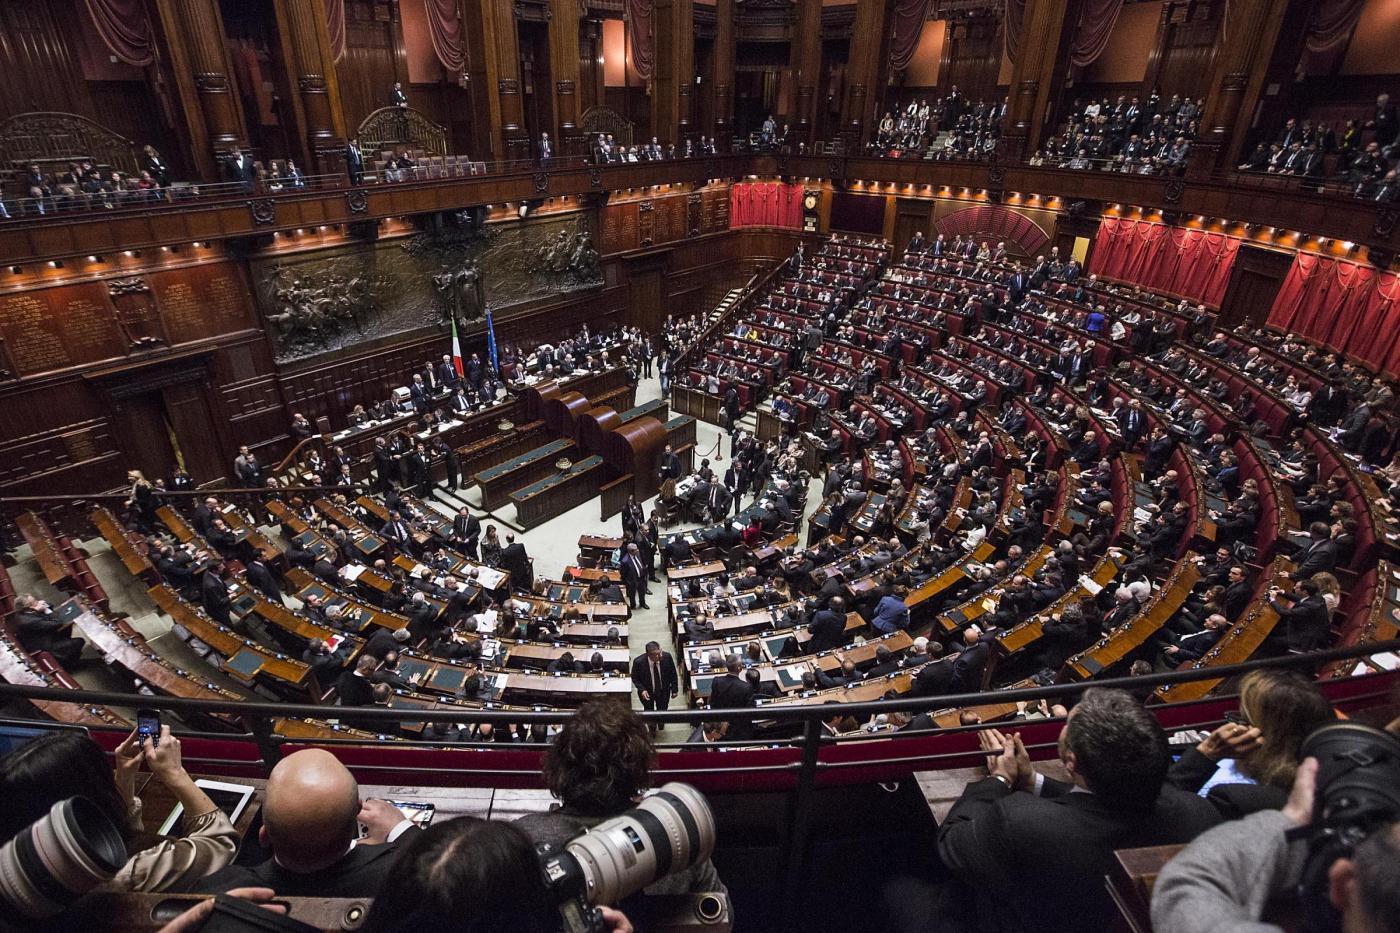 L'ircocervo di Berlusconie le intese di Salvini e Di Maio